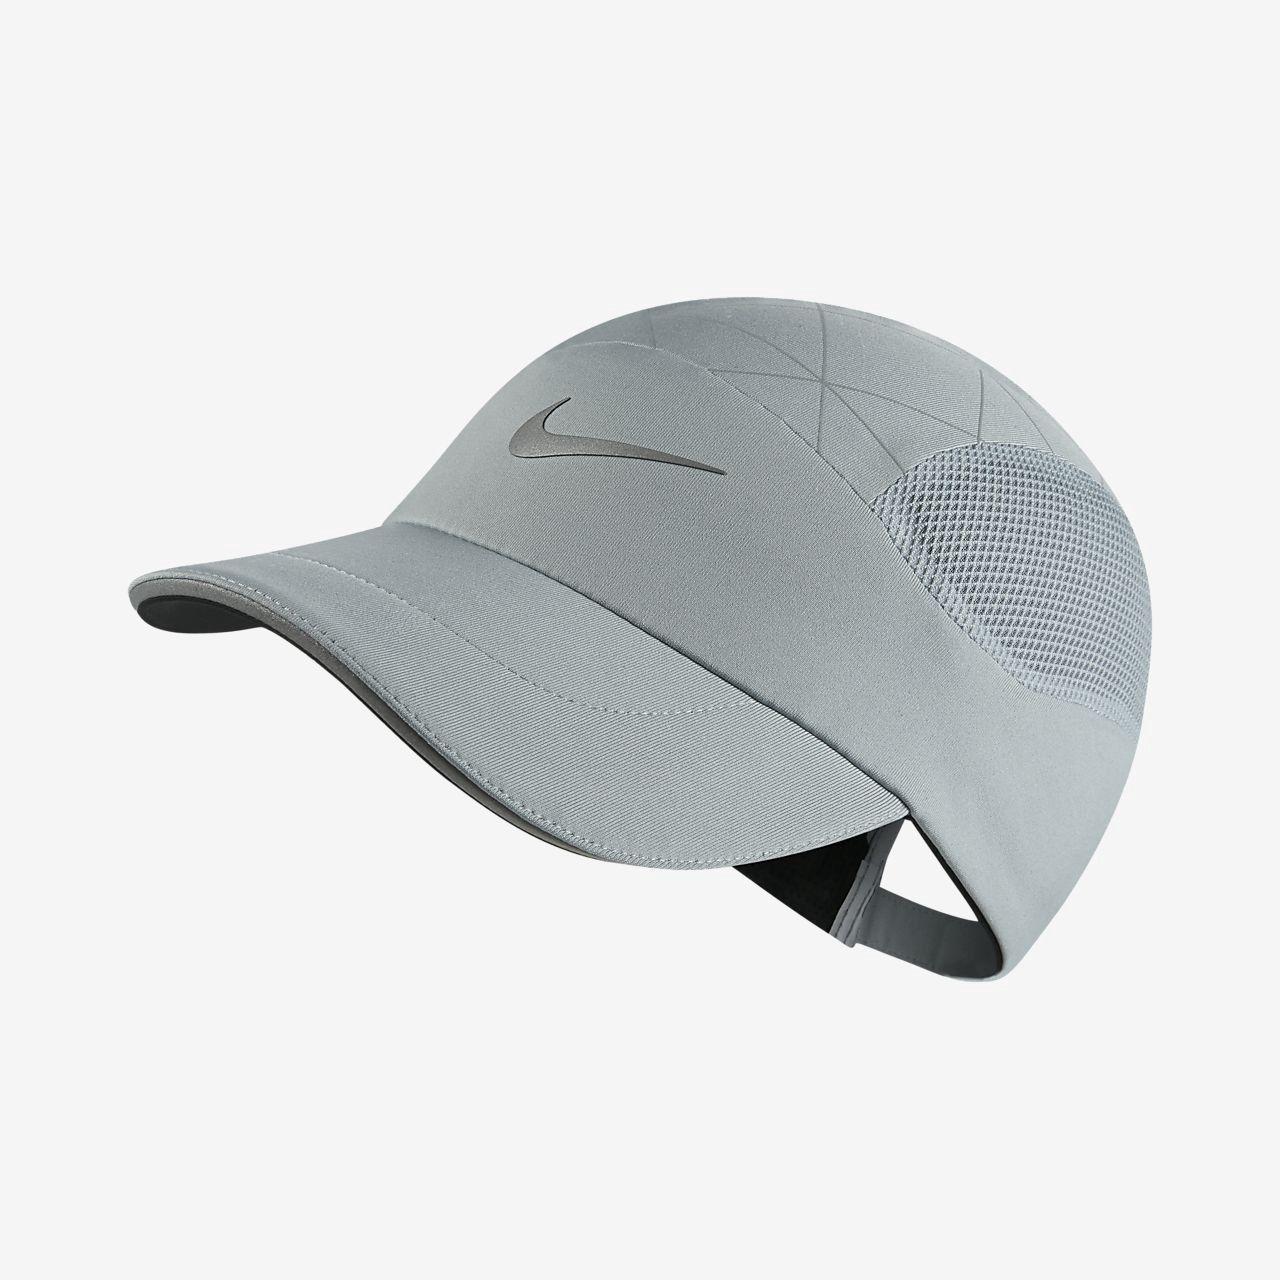 Nike Aerobill Tailwind Adjustable Running Hat Light Pumice Os Running Hats Nike Riding Helmets